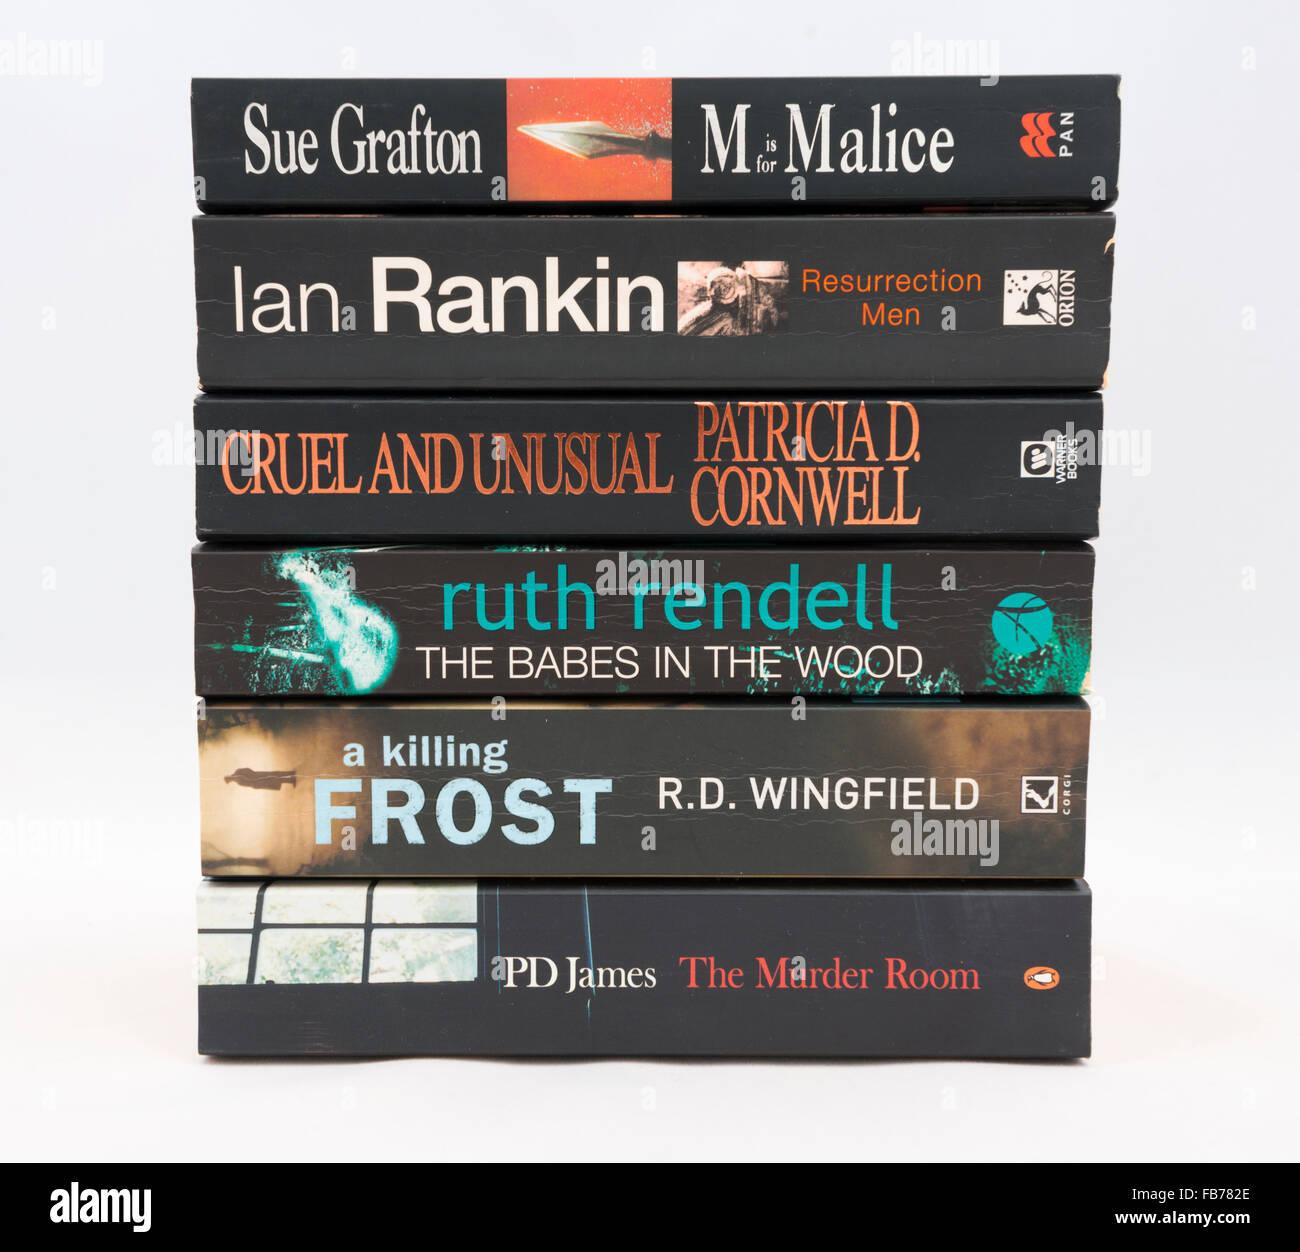 Kriminalromane von Bestseller-Autoren - Ian Rankin, Sue Grafton, PD James, r.d. Wingfield, Ruth Rendell, Patricia Stockbild